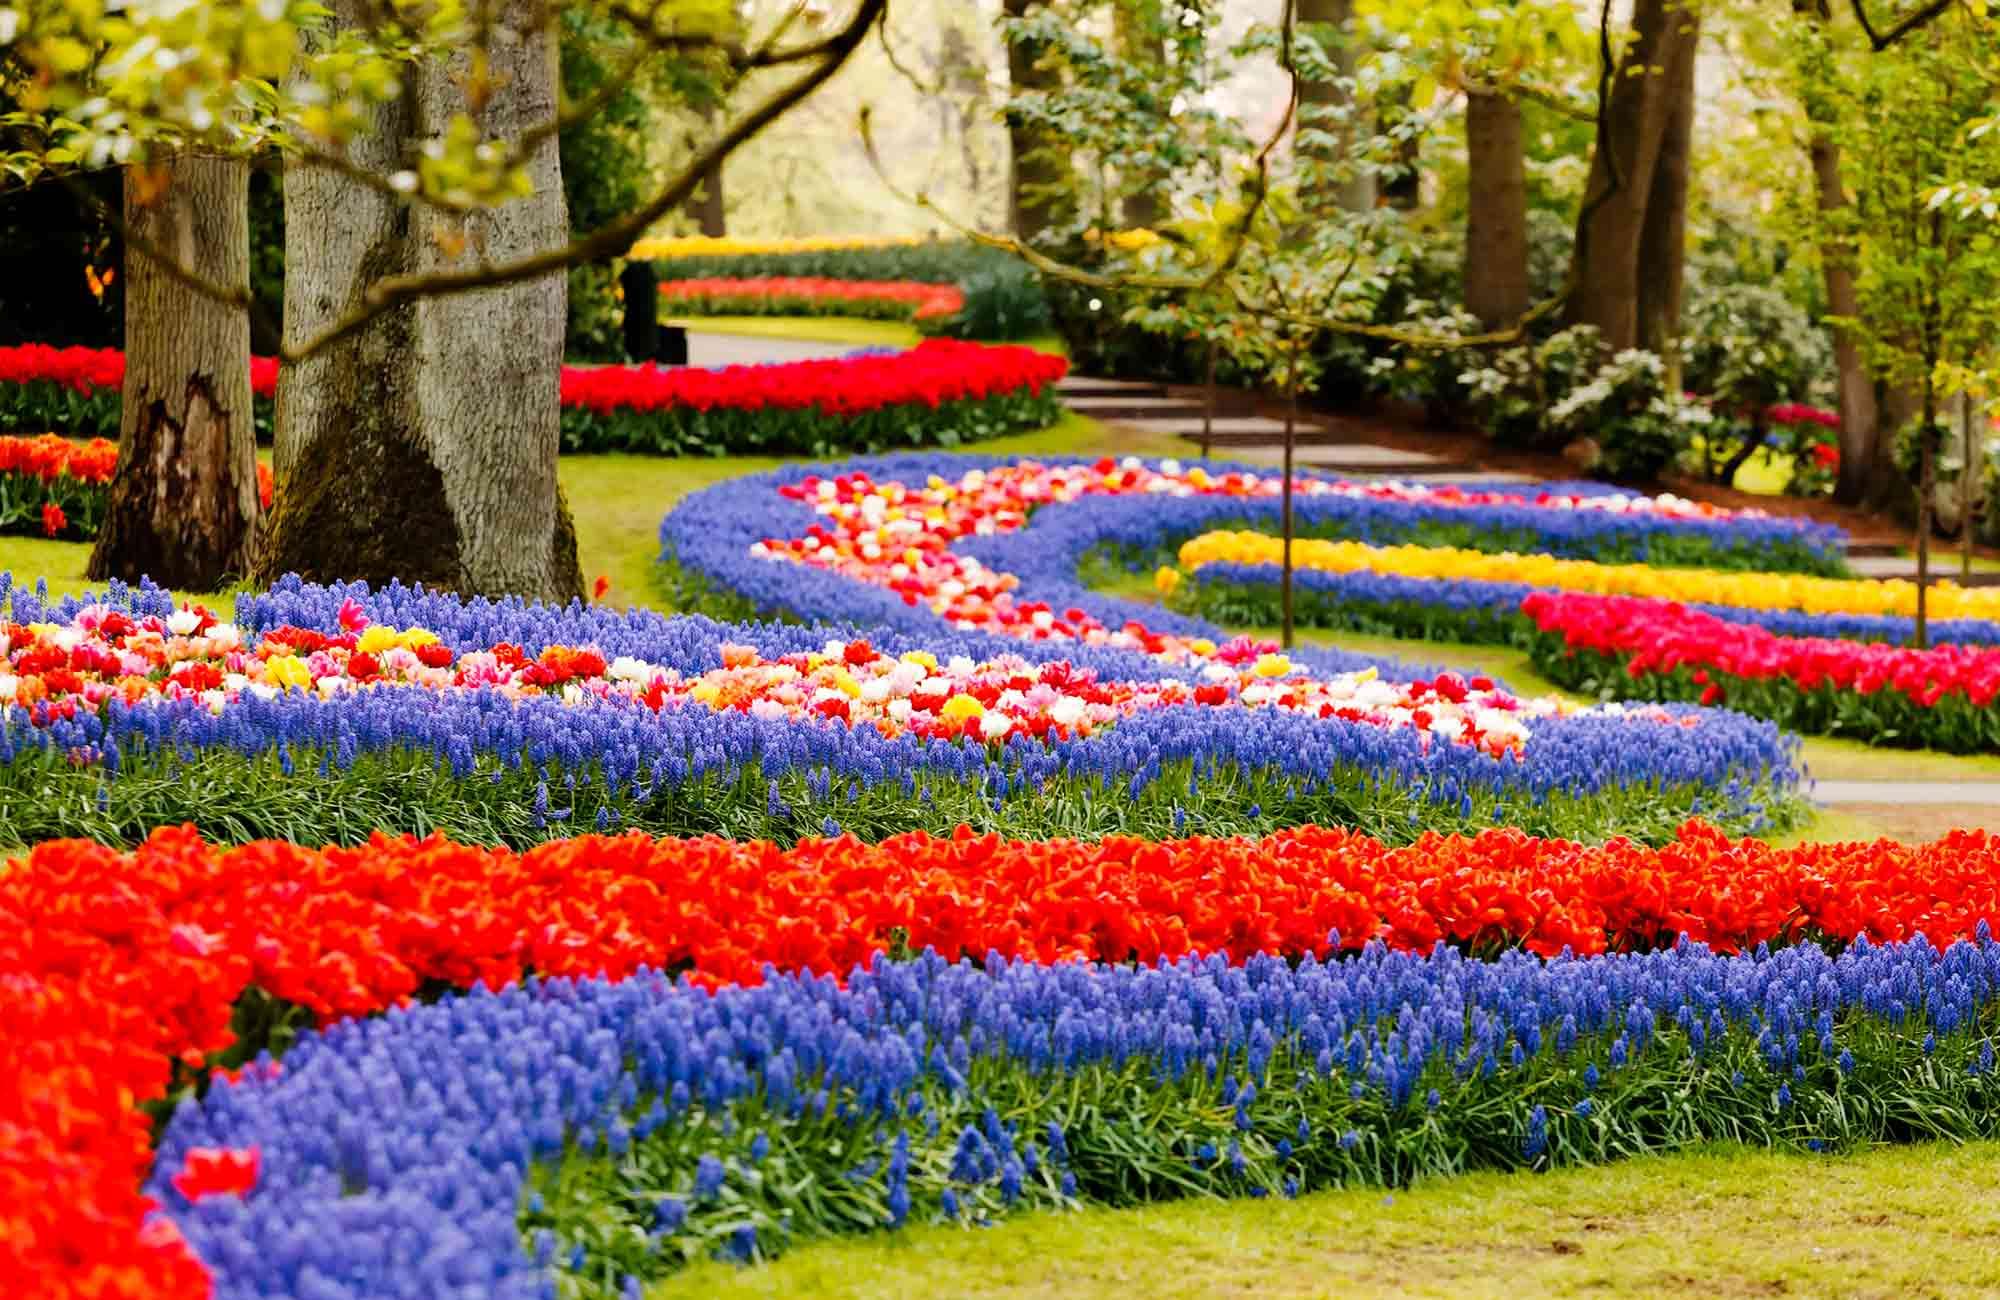 Voyage Pays-Bas - Jardins de Keukenhof - Amplitudes